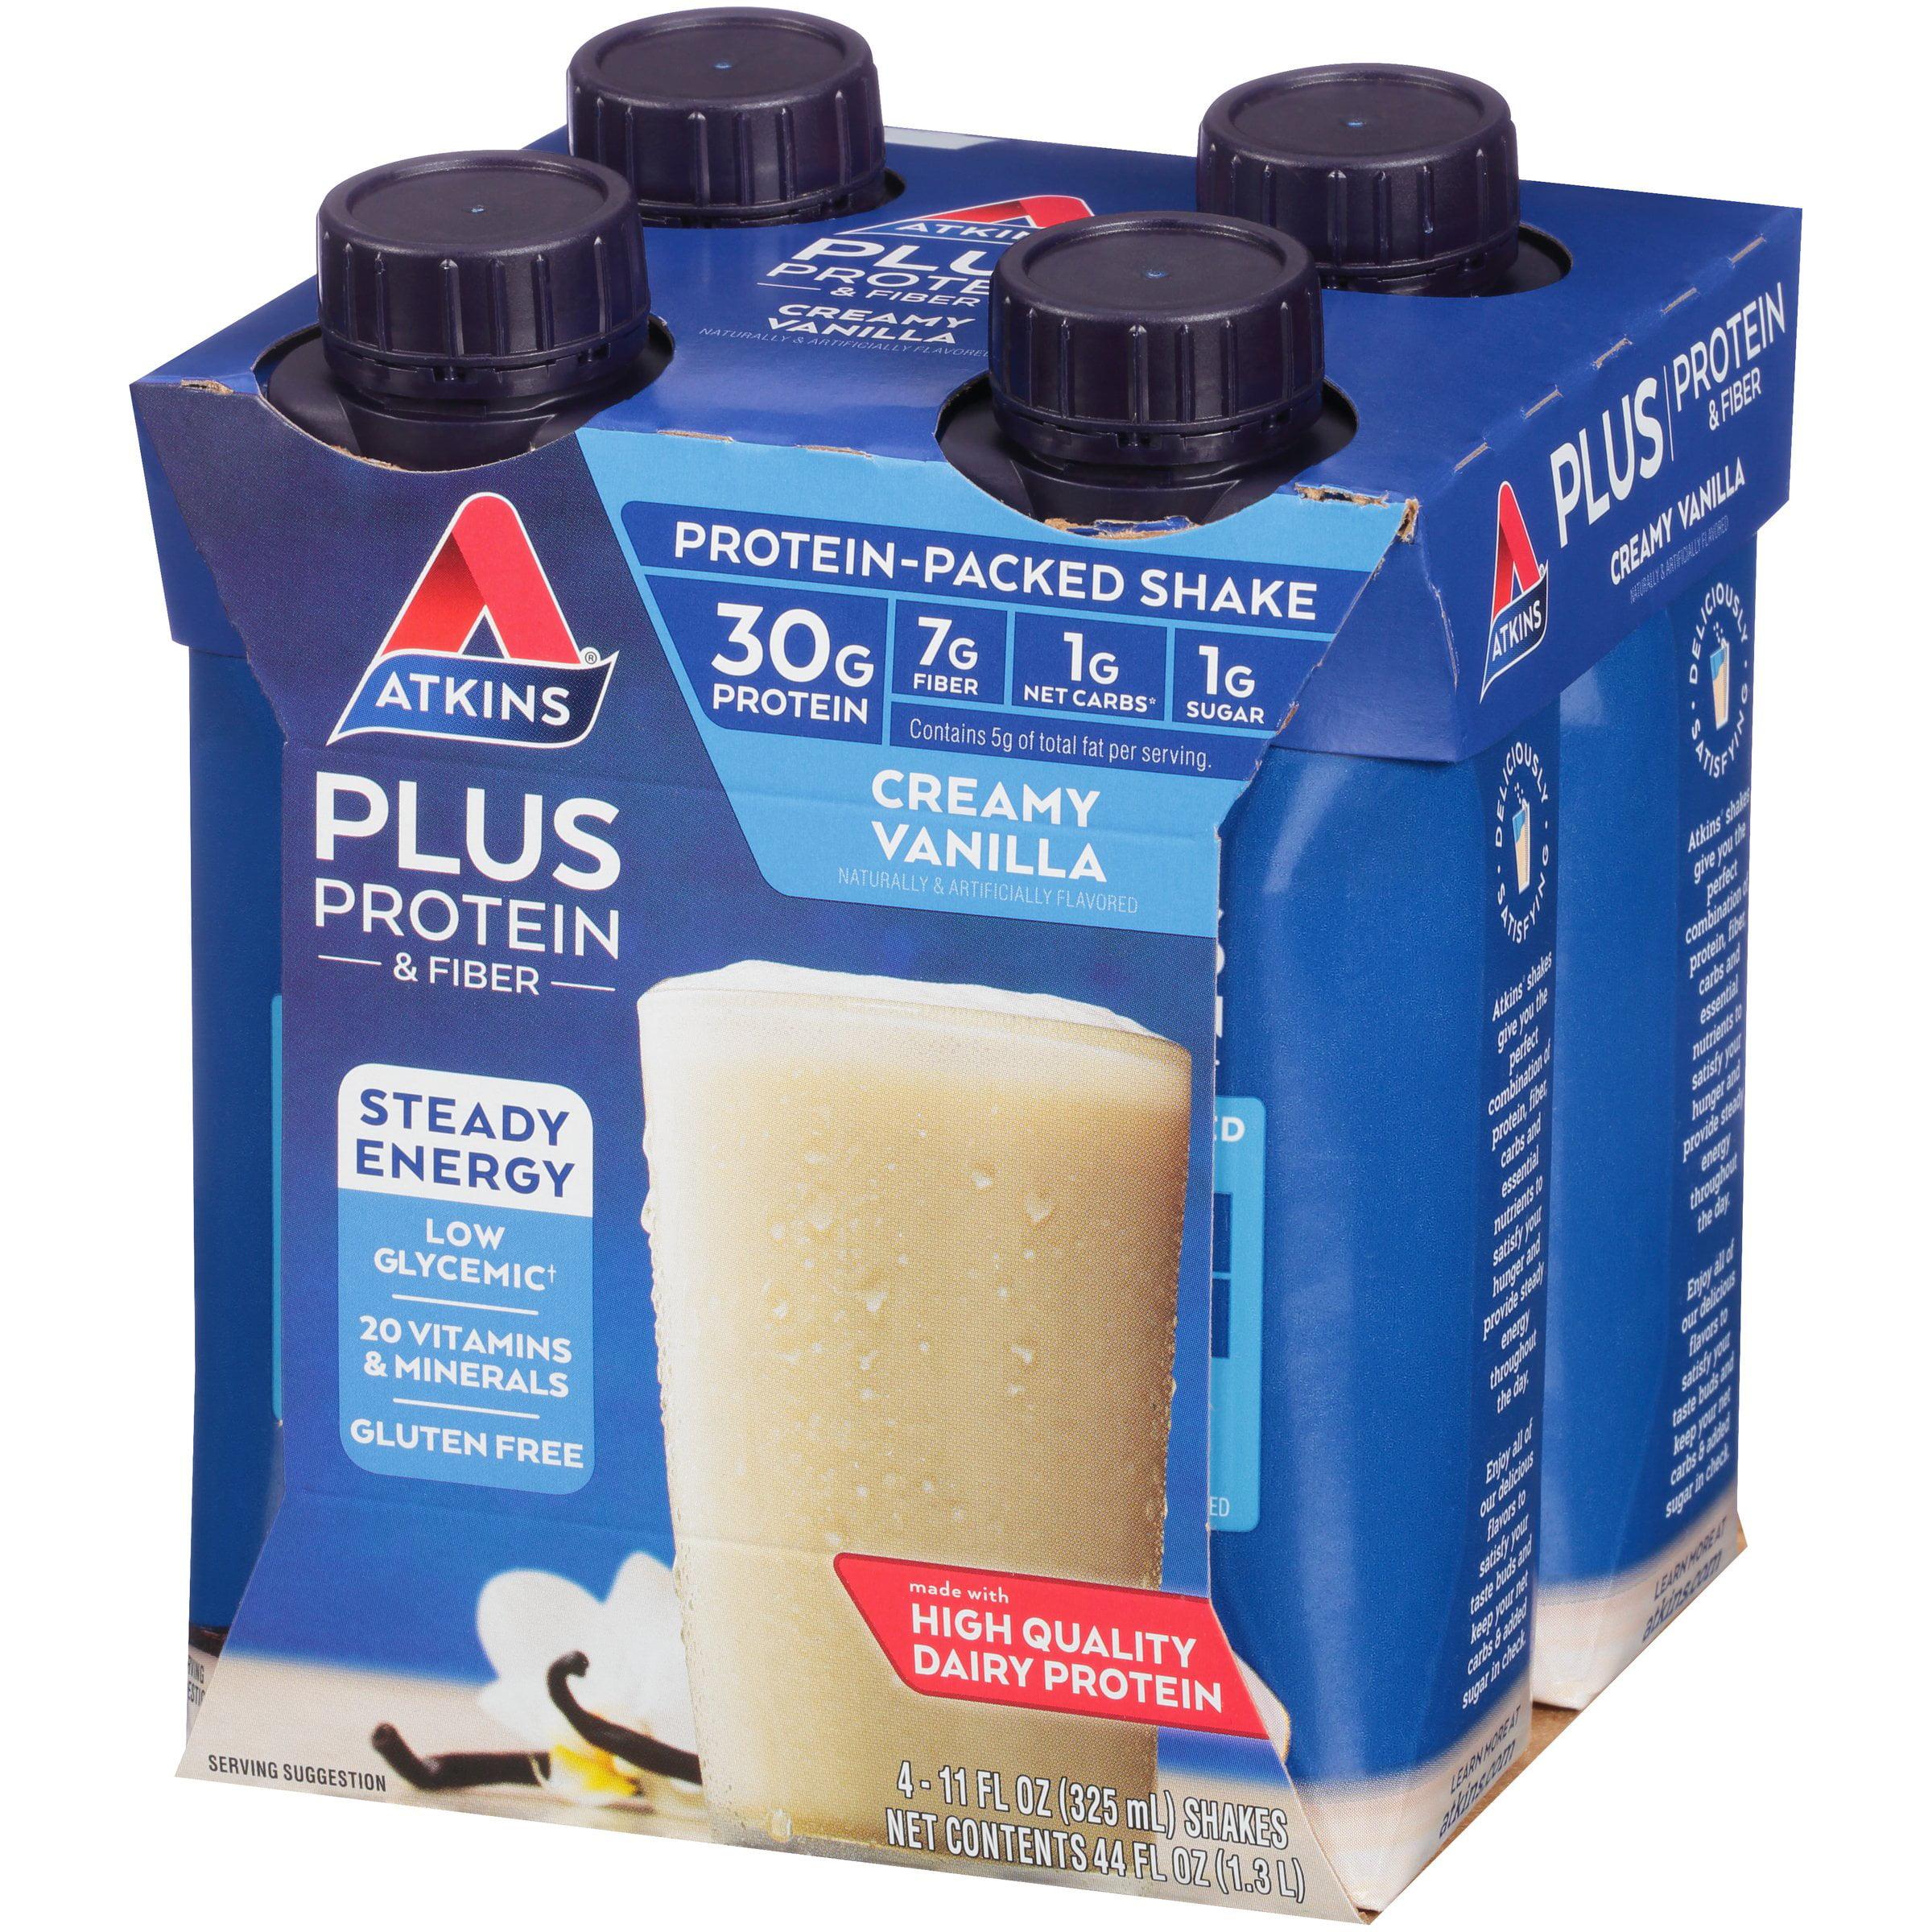 6bb0742ba9f03f Atkins PLUS Protein   Fiber Creamy Vanilla Shake